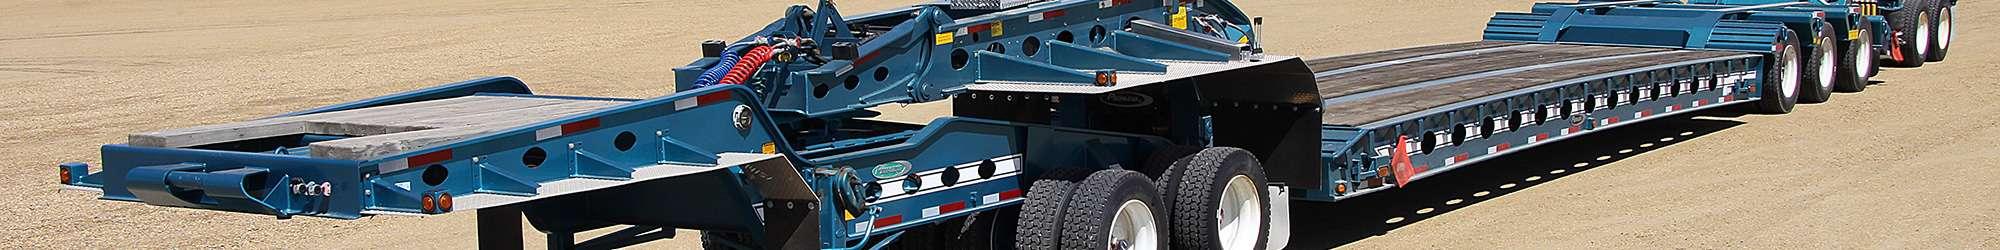 Heavy Equipment Rentals - Brandt Truck Rigging & trailers